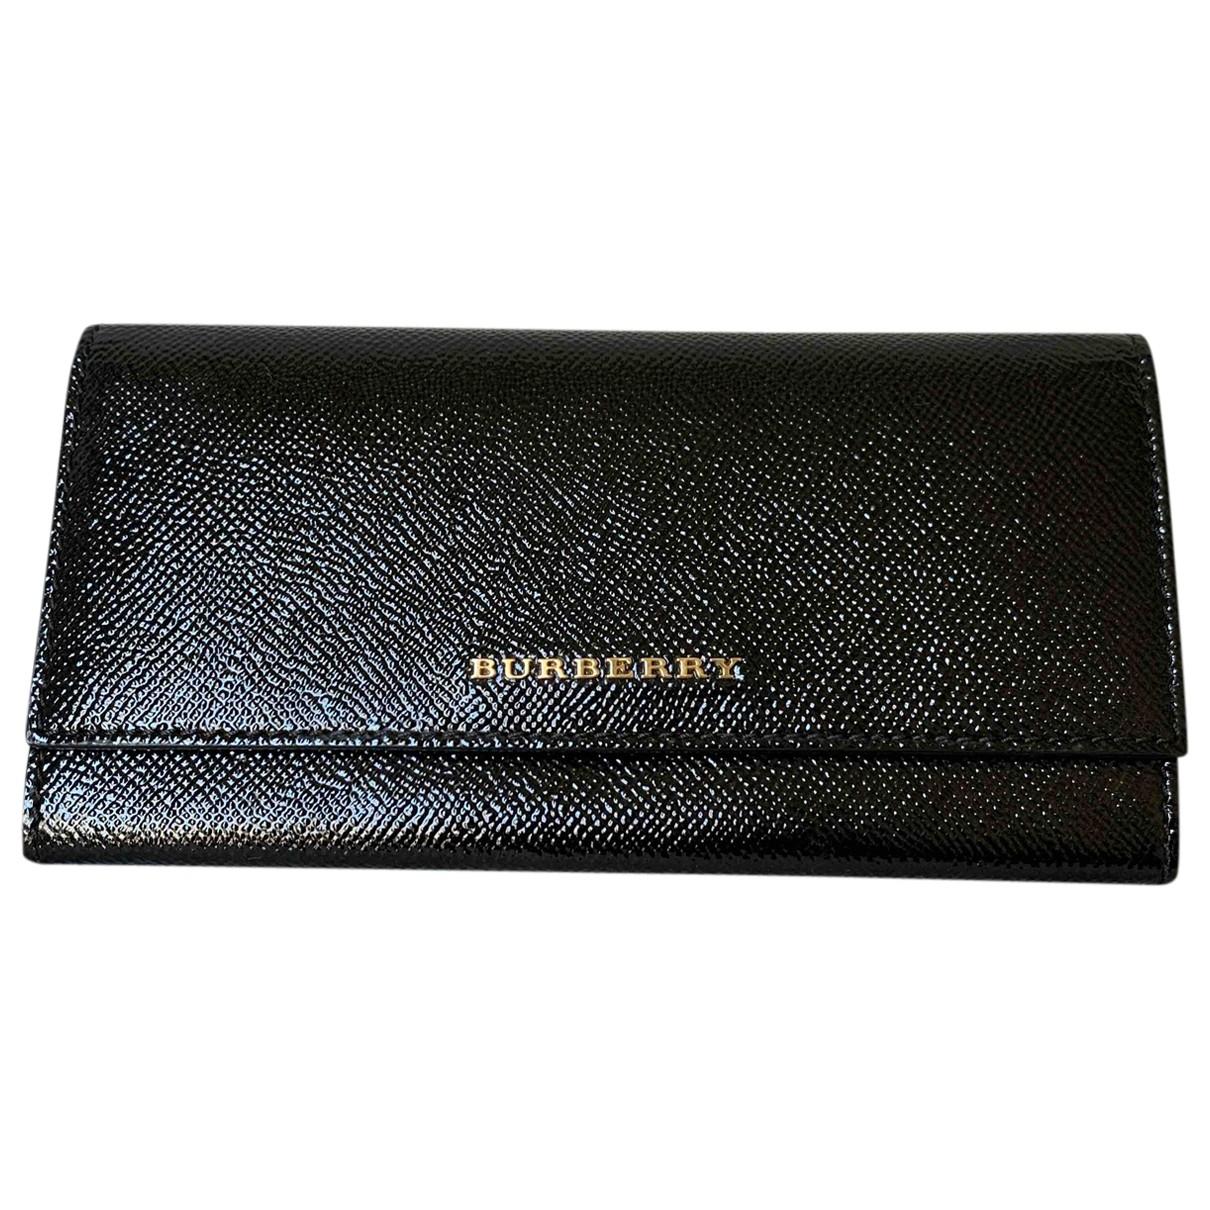 Burberry \N Black Leather wallet for Women \N